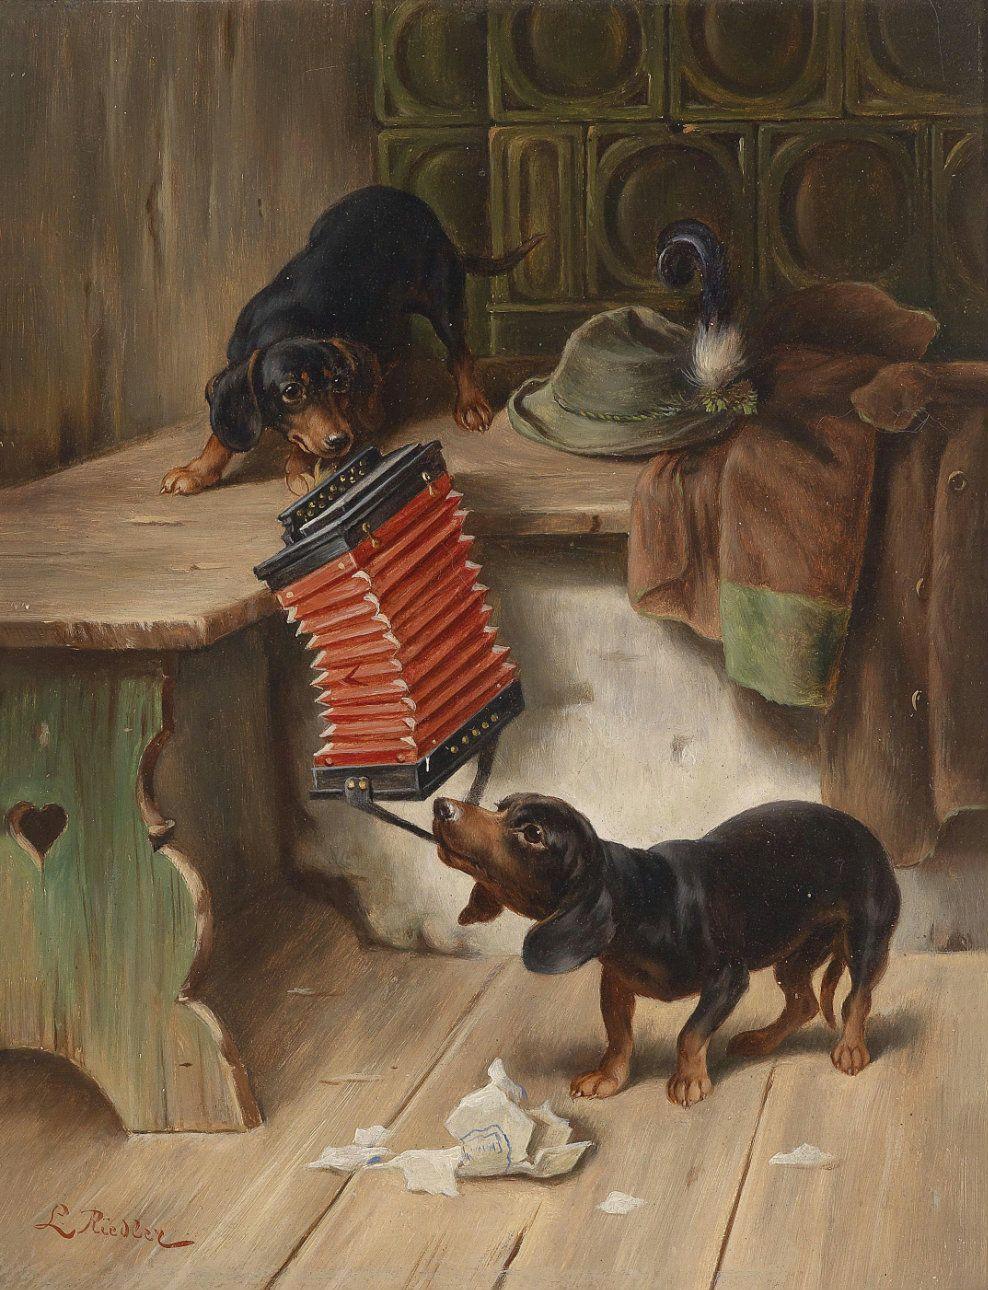 amazoncom painting animal dachshund dog fox reichert